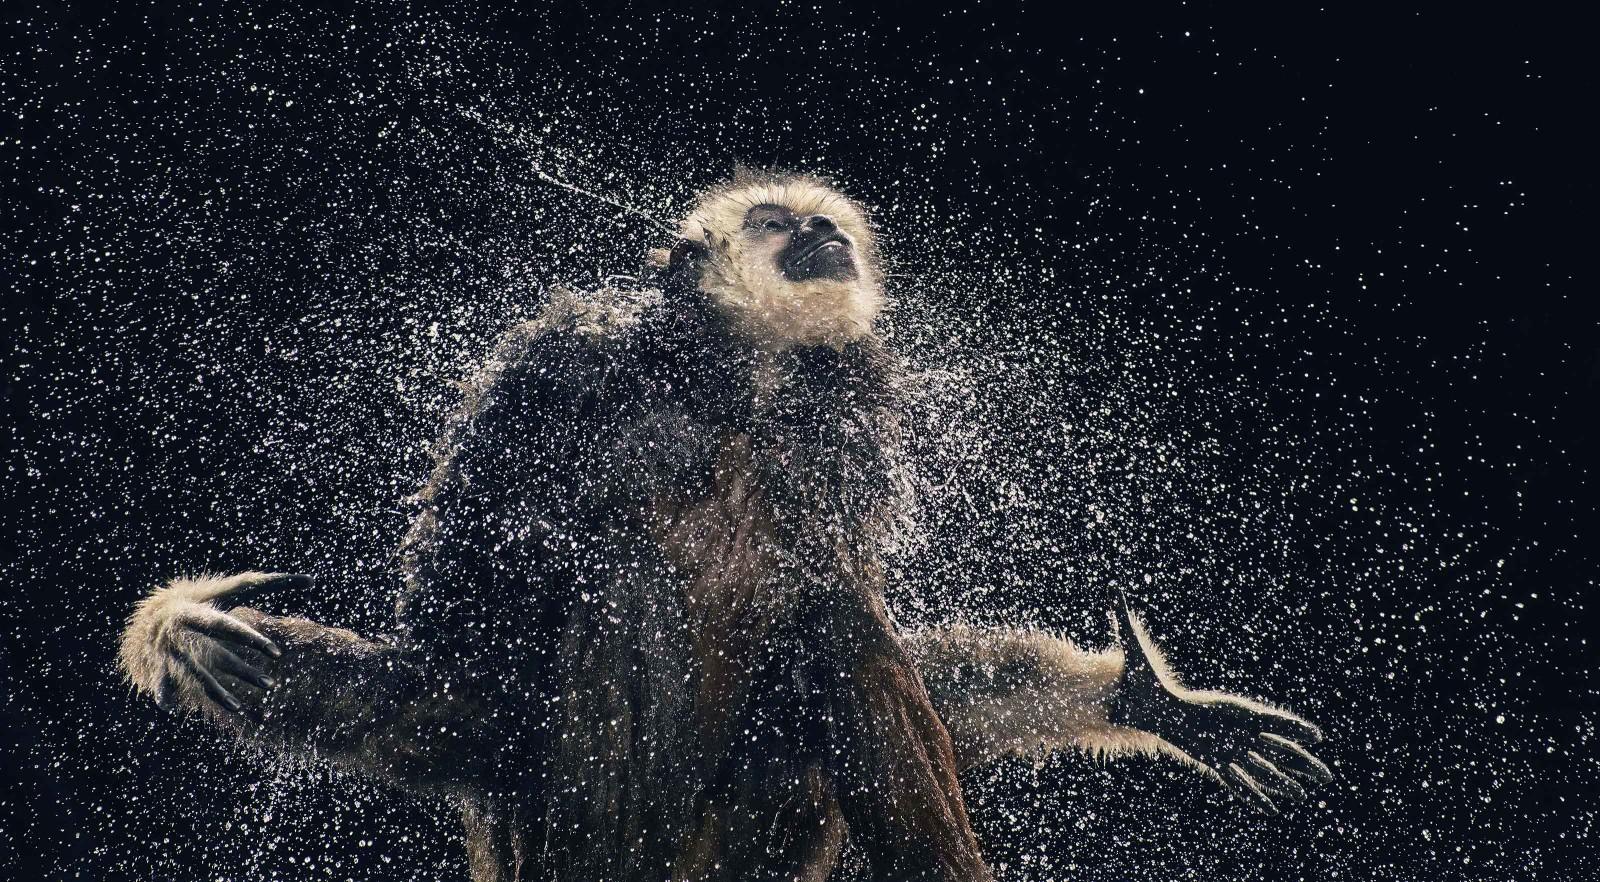 gibbon-shaking1-1600x882